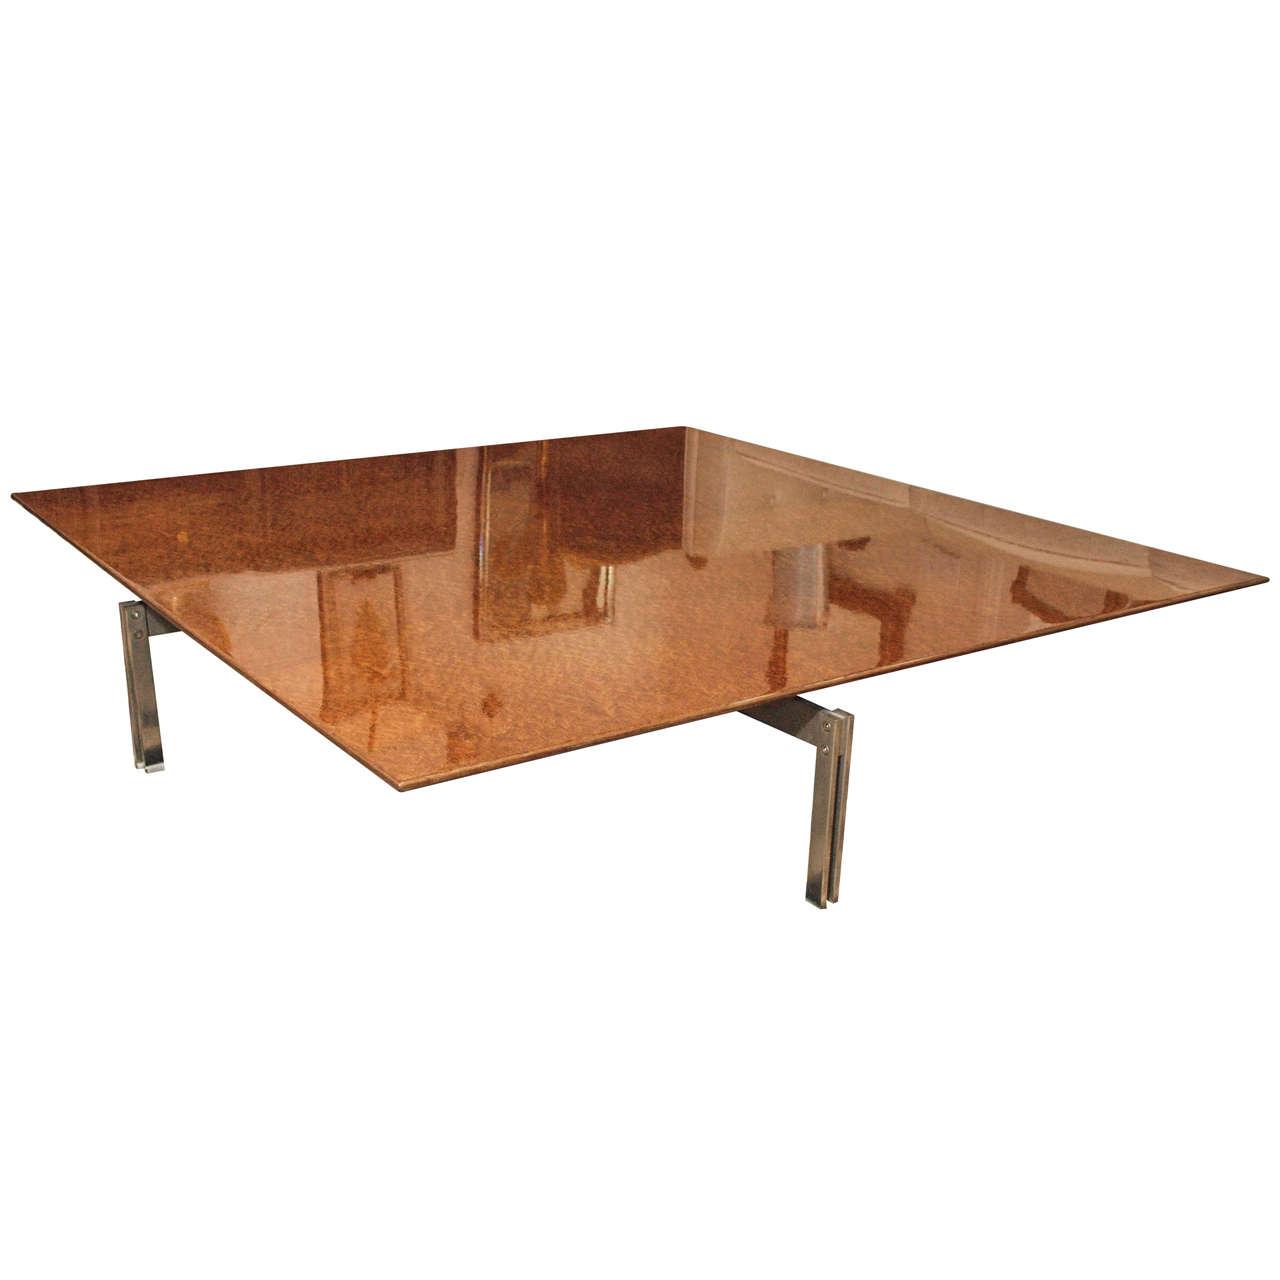 Large And Impressive Burlwood Low Table By Saporiti Italia At 1stdibs